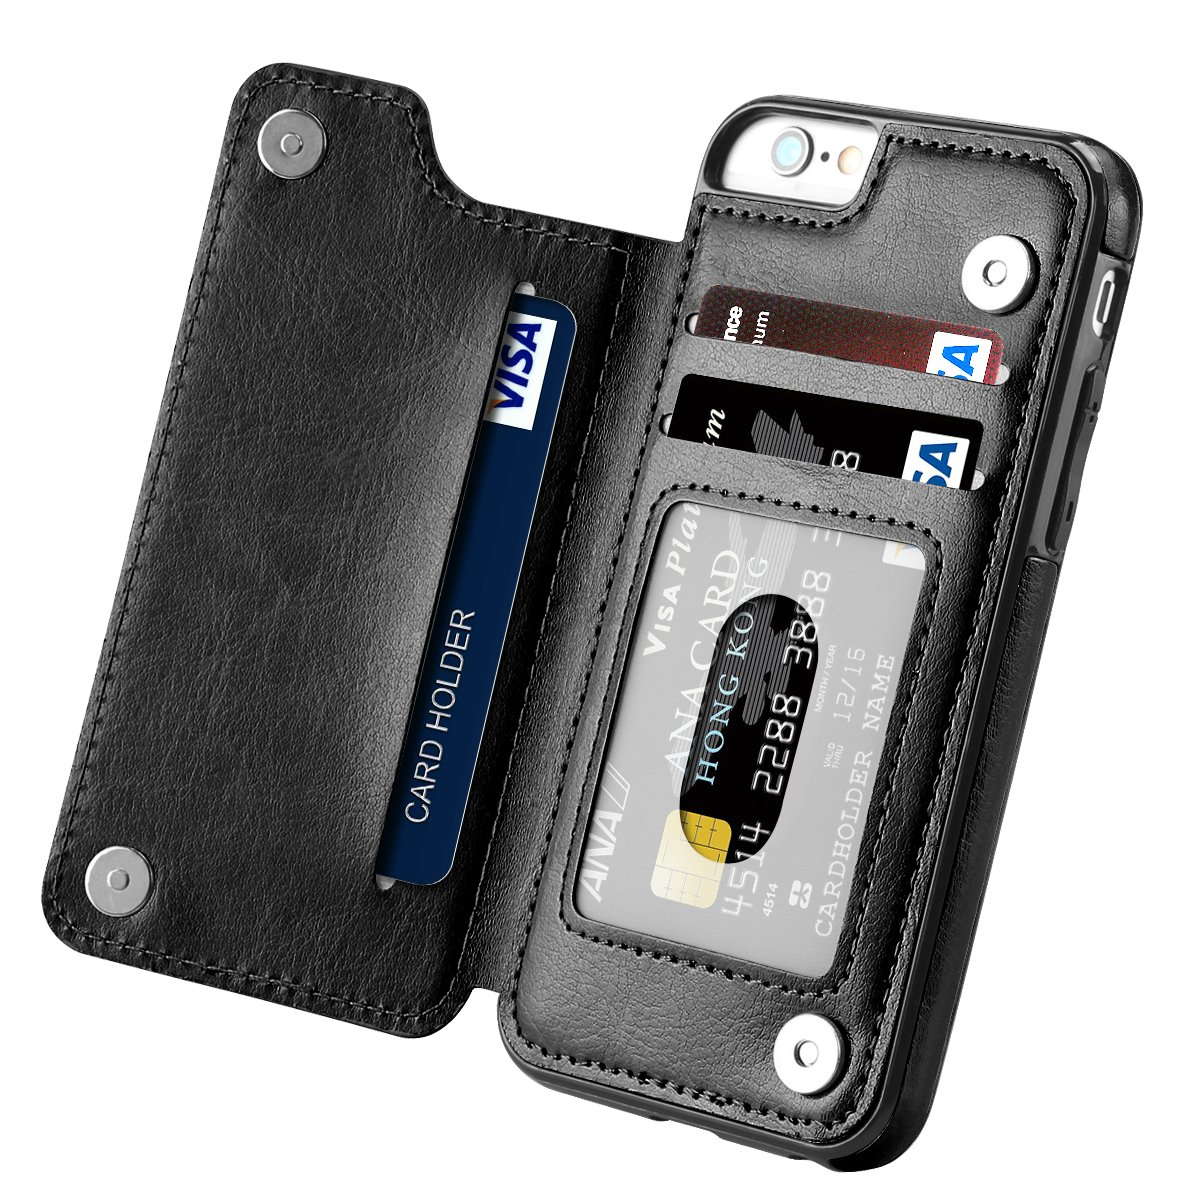 iPhone 6s Case, iPhone 6 Case, Hoofur Slim Fit Premium Leather iPhone 6 Wallet Casae Card Slots Shockproof Folio Flip Protective Shell for Apple iPhone 6/6s (4.7 Inch) (Black) by Hoofur